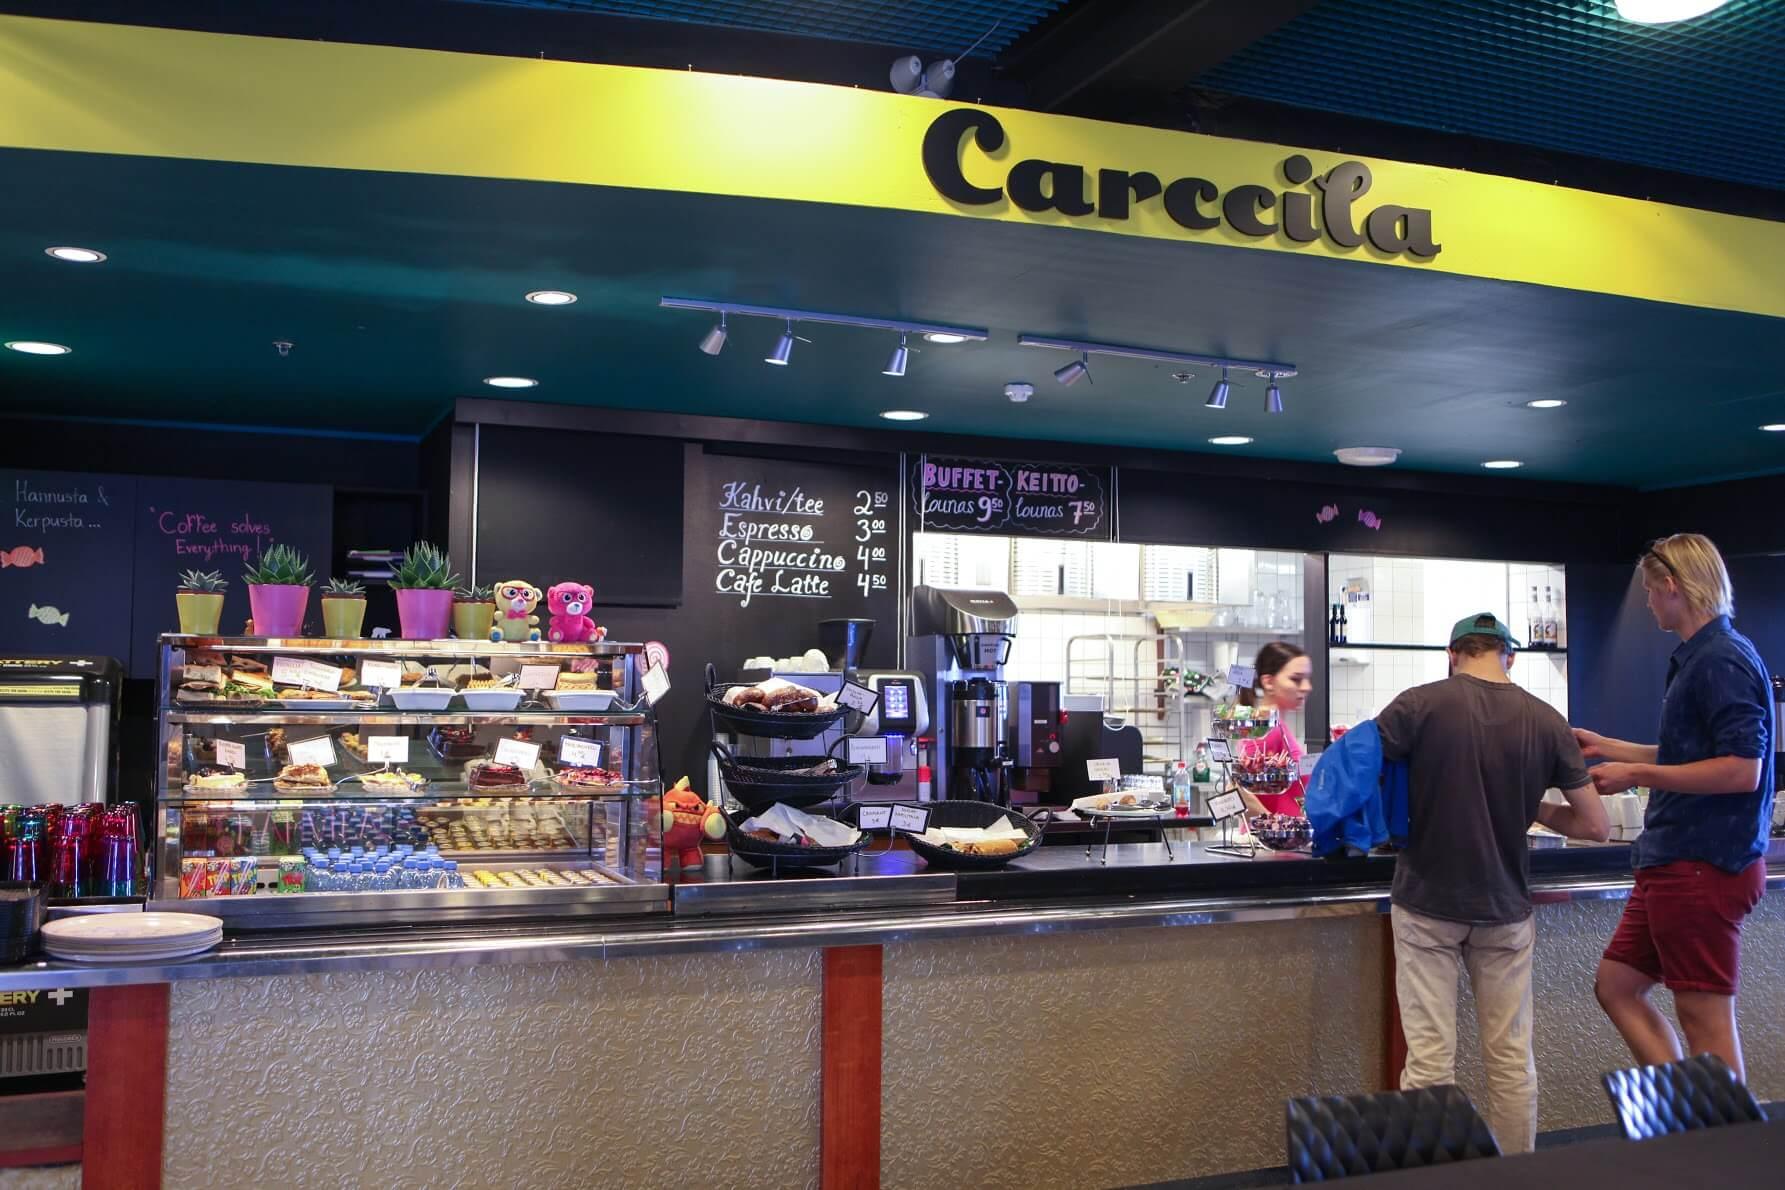 Carccila Cafe